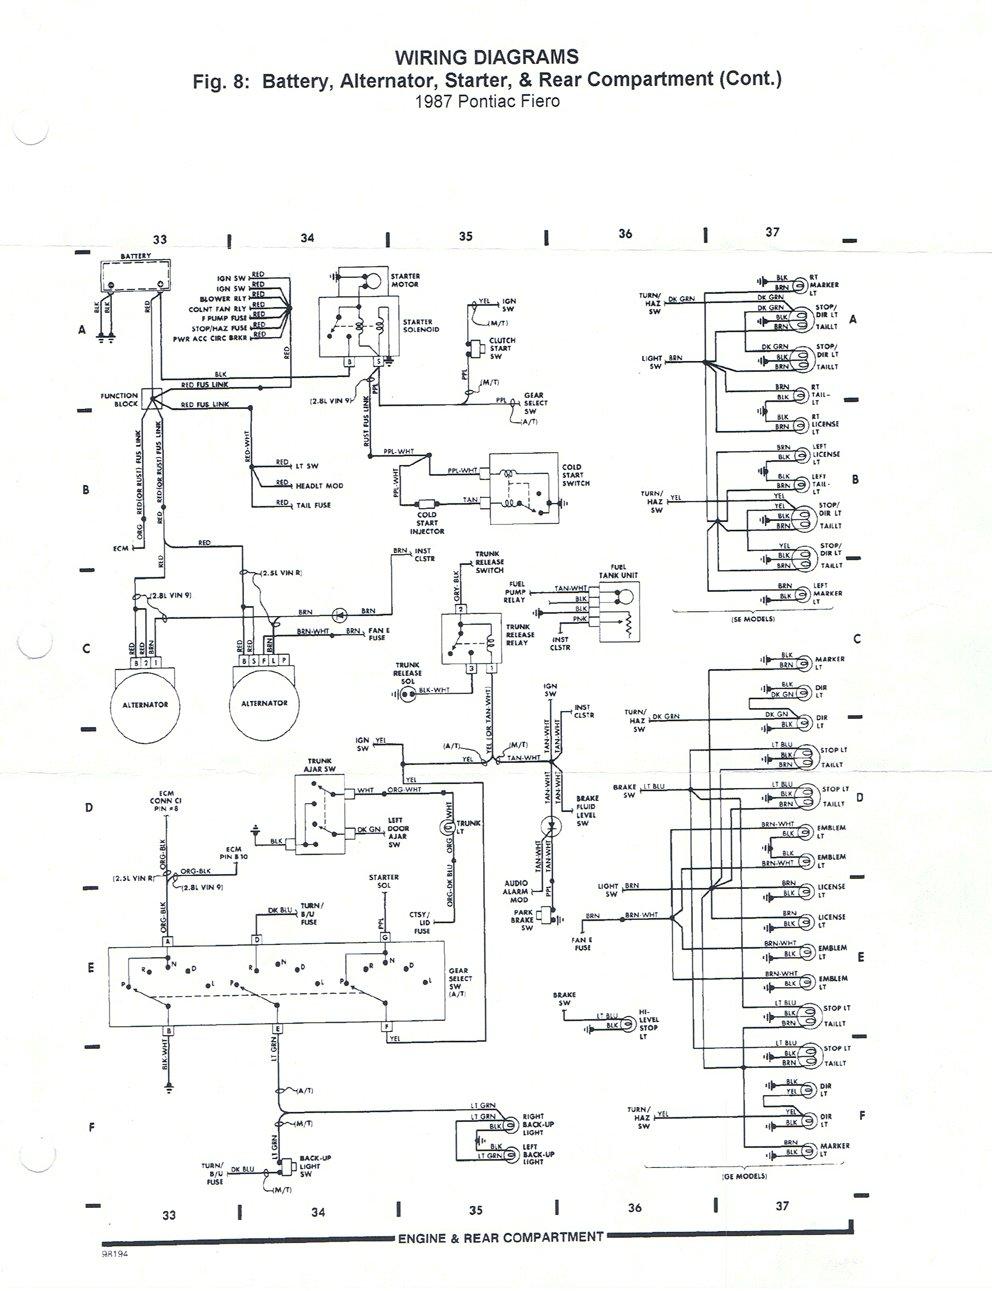 fine fiero backup light wiring bmw 330xi fuse diagram 07 f150 transmission  diagram toyota tundra electrical